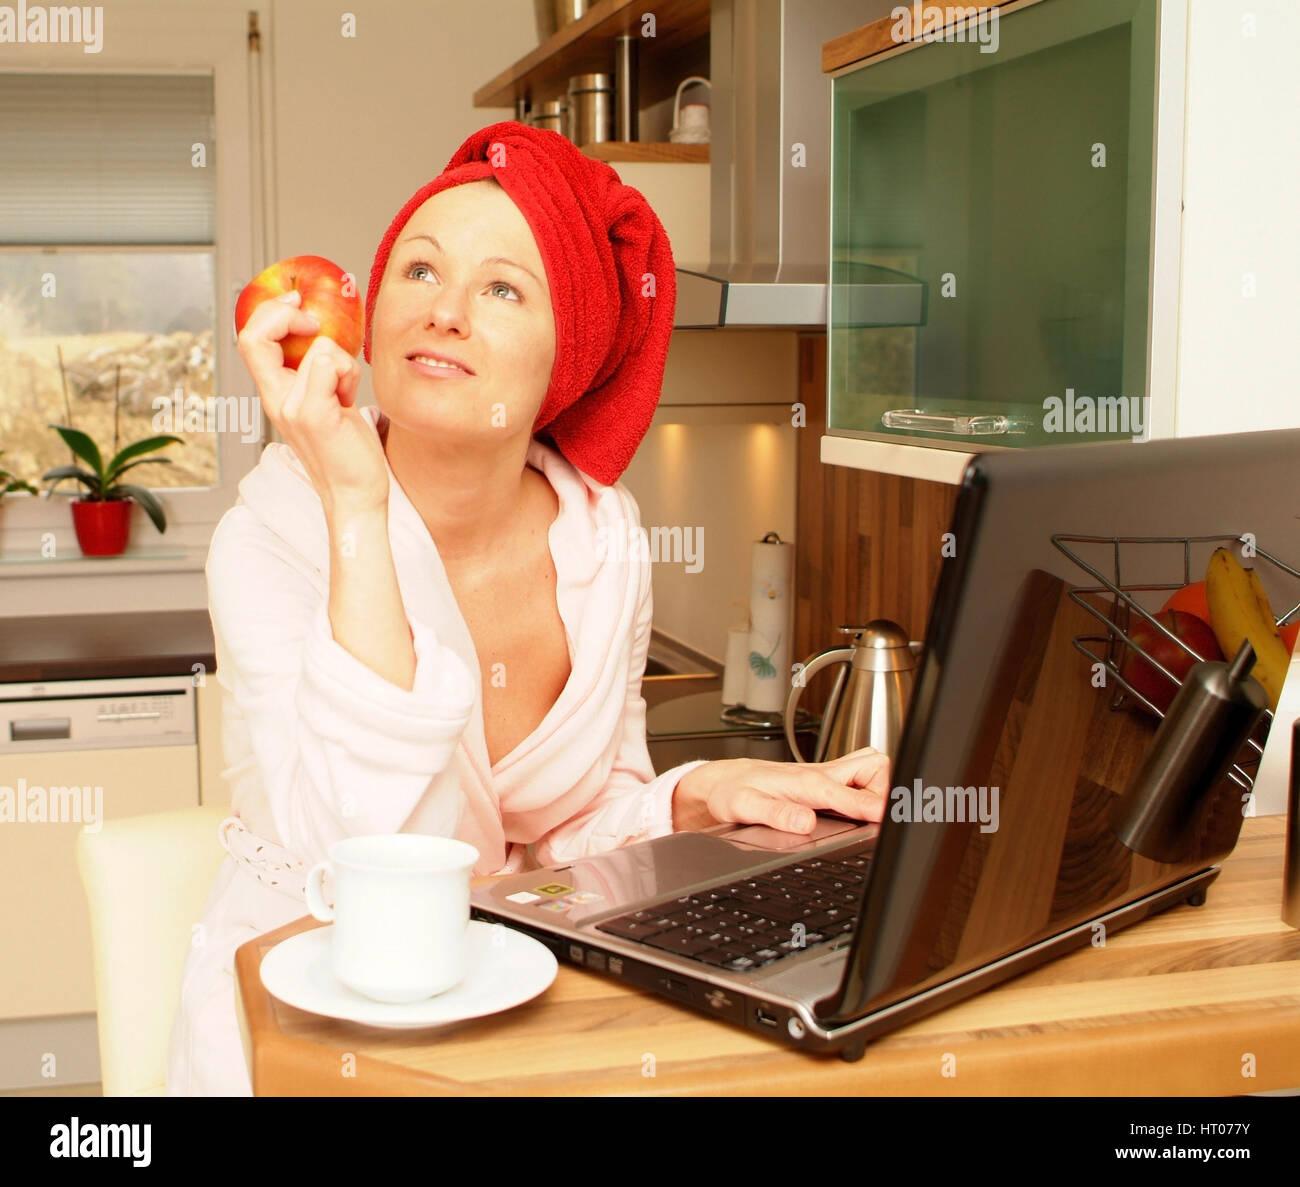 Junge Frau im Morgenmantel arbeitet am Notebook und isst einen Apfel - young woman in bath robe using laptop and - Stock Image